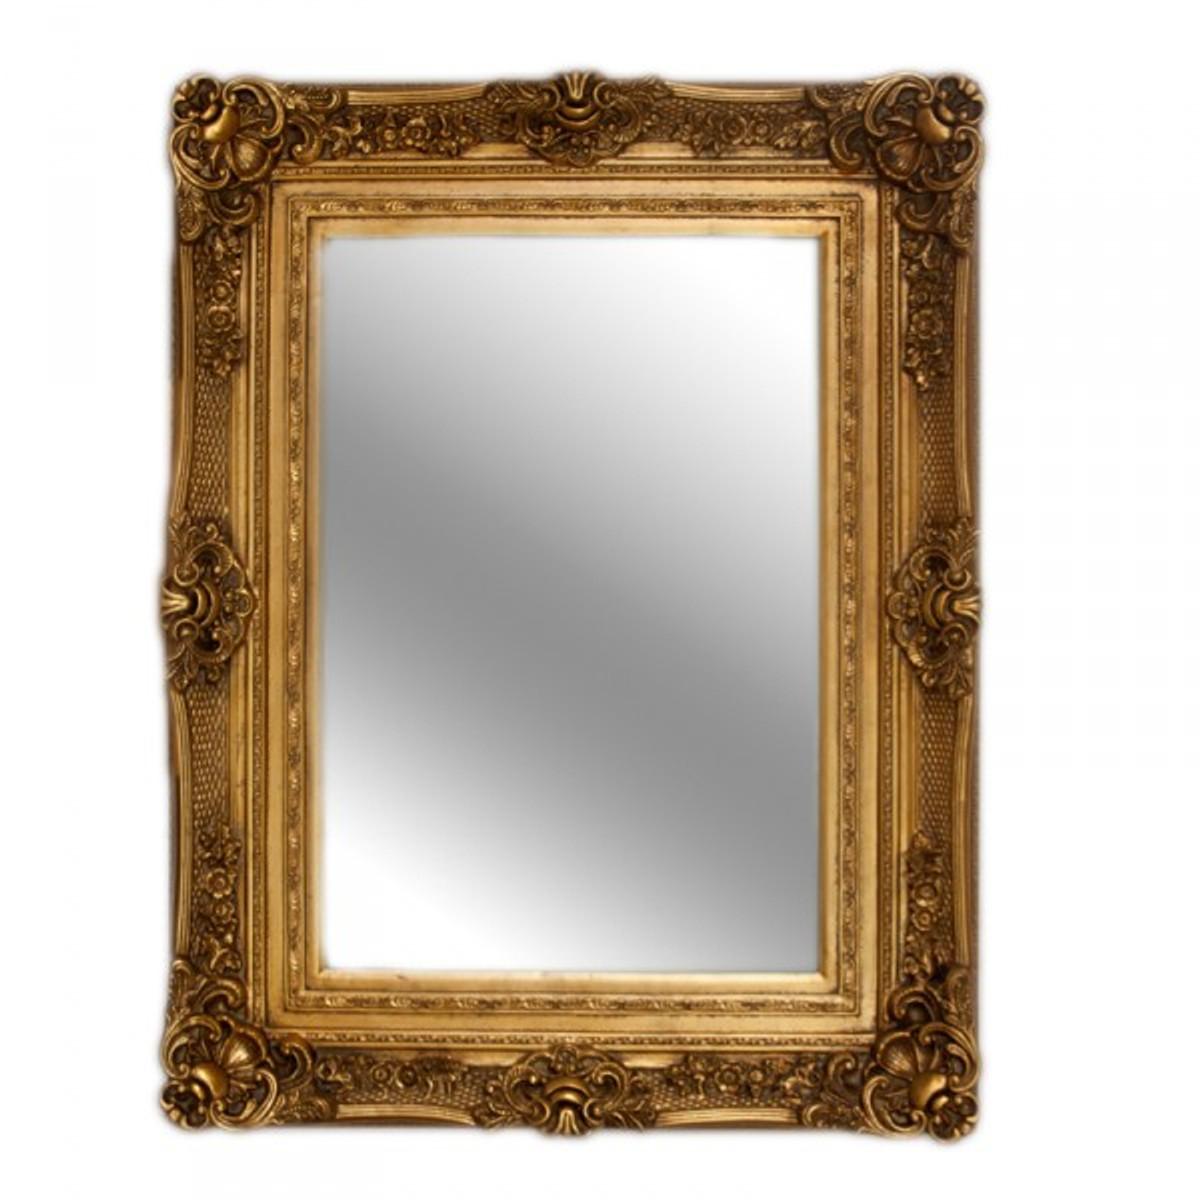 casa padrino barock wandspiegel gold antik look h he 121 cm breite 90 cm edel prunkvoll. Black Bedroom Furniture Sets. Home Design Ideas